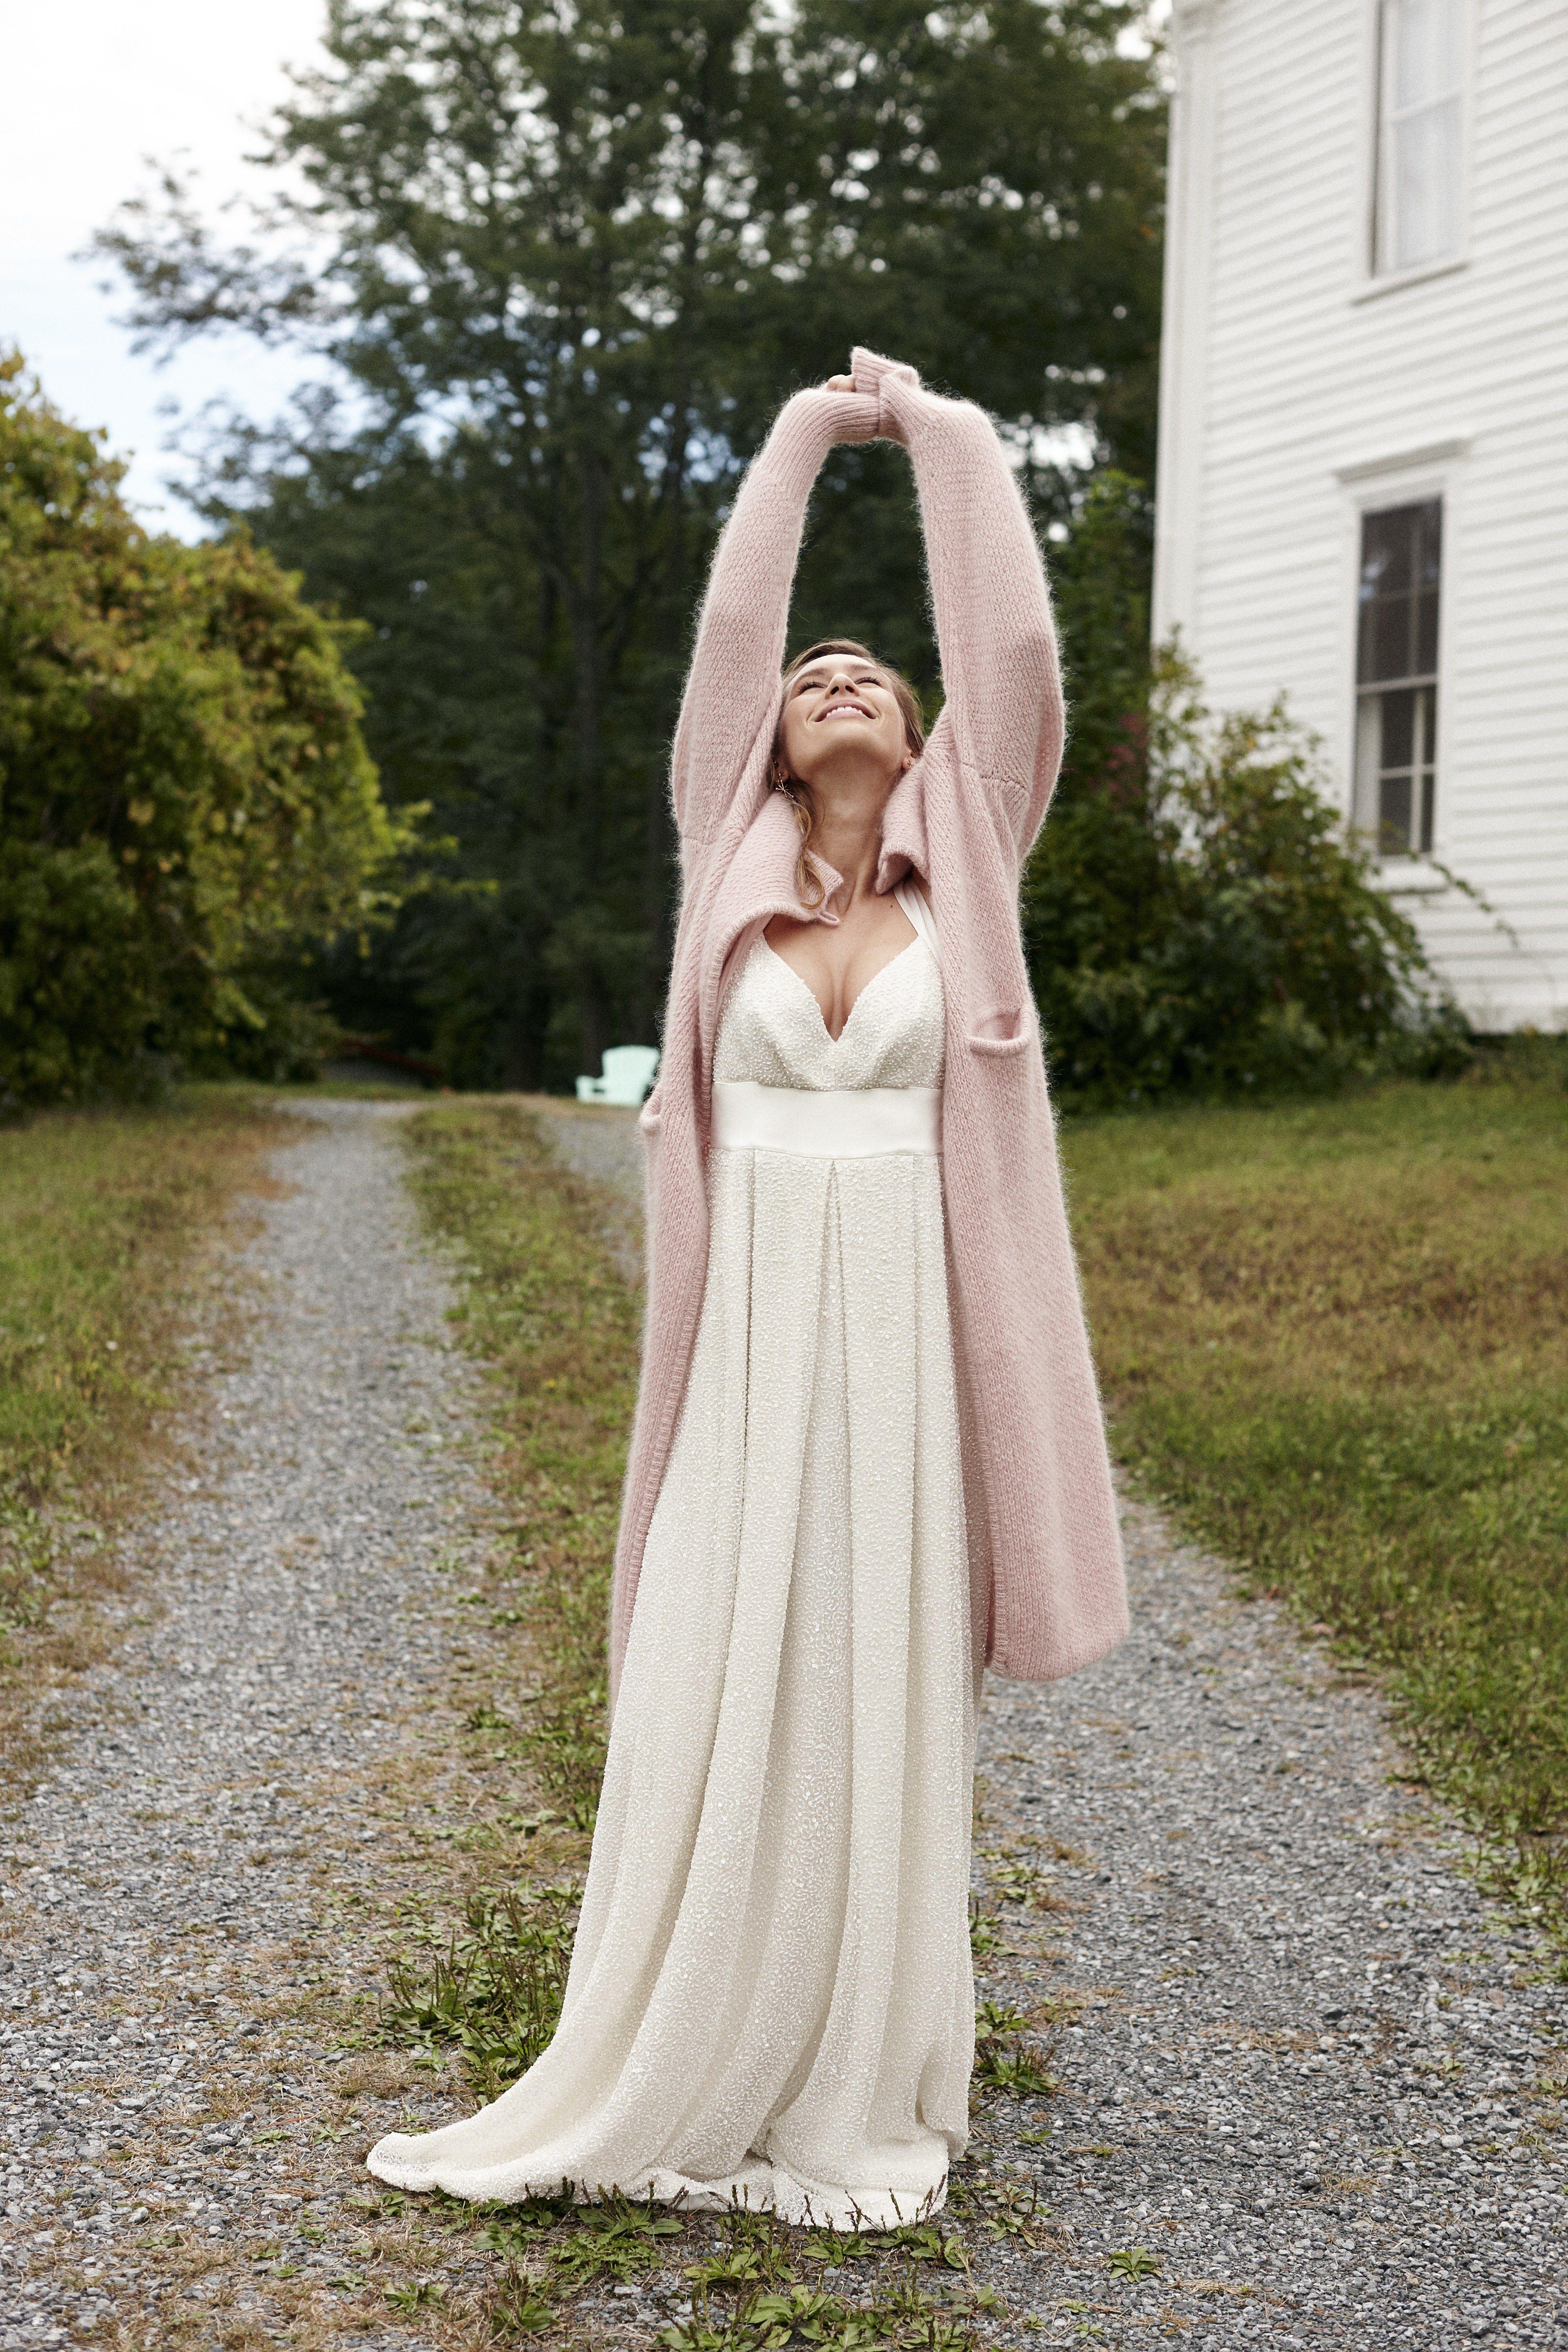 New Savannah Miller Wedding Dresses Plus Past Collections Cute Wedding Outfits Winter Wedding Dress Wedding Dress With Cardigan [ 5616 x 3744 Pixel ]